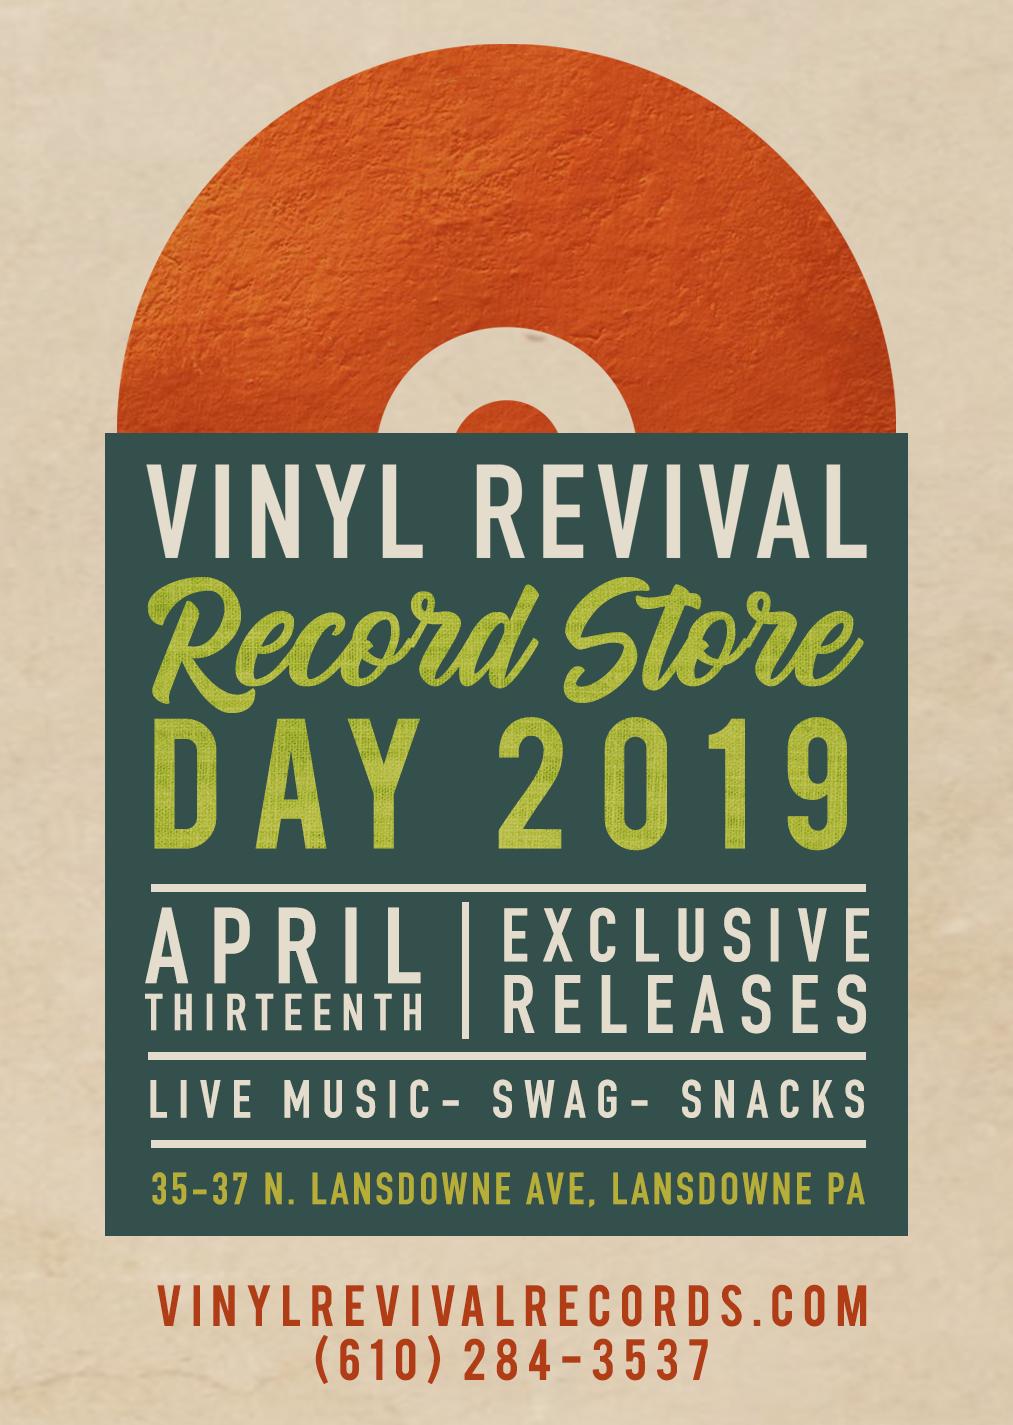 26c788ed5 Record Store Day 2019 – April 13th